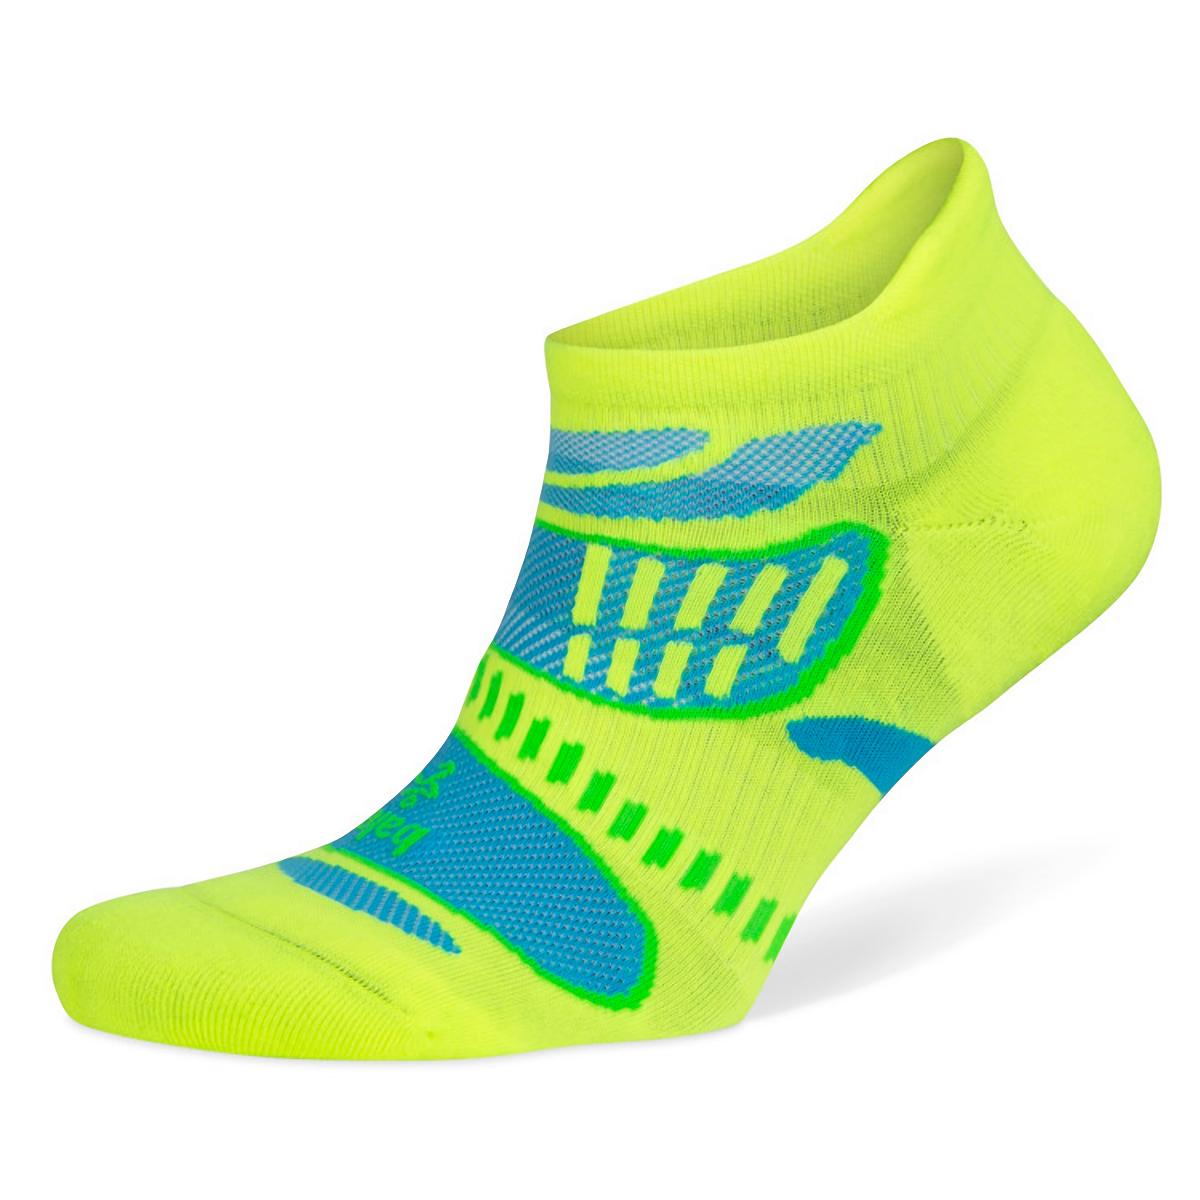 Balega Ultra Light No Show Tab Socks - Color: Neon Lime - Size: S, Neon Lime, large, image 1